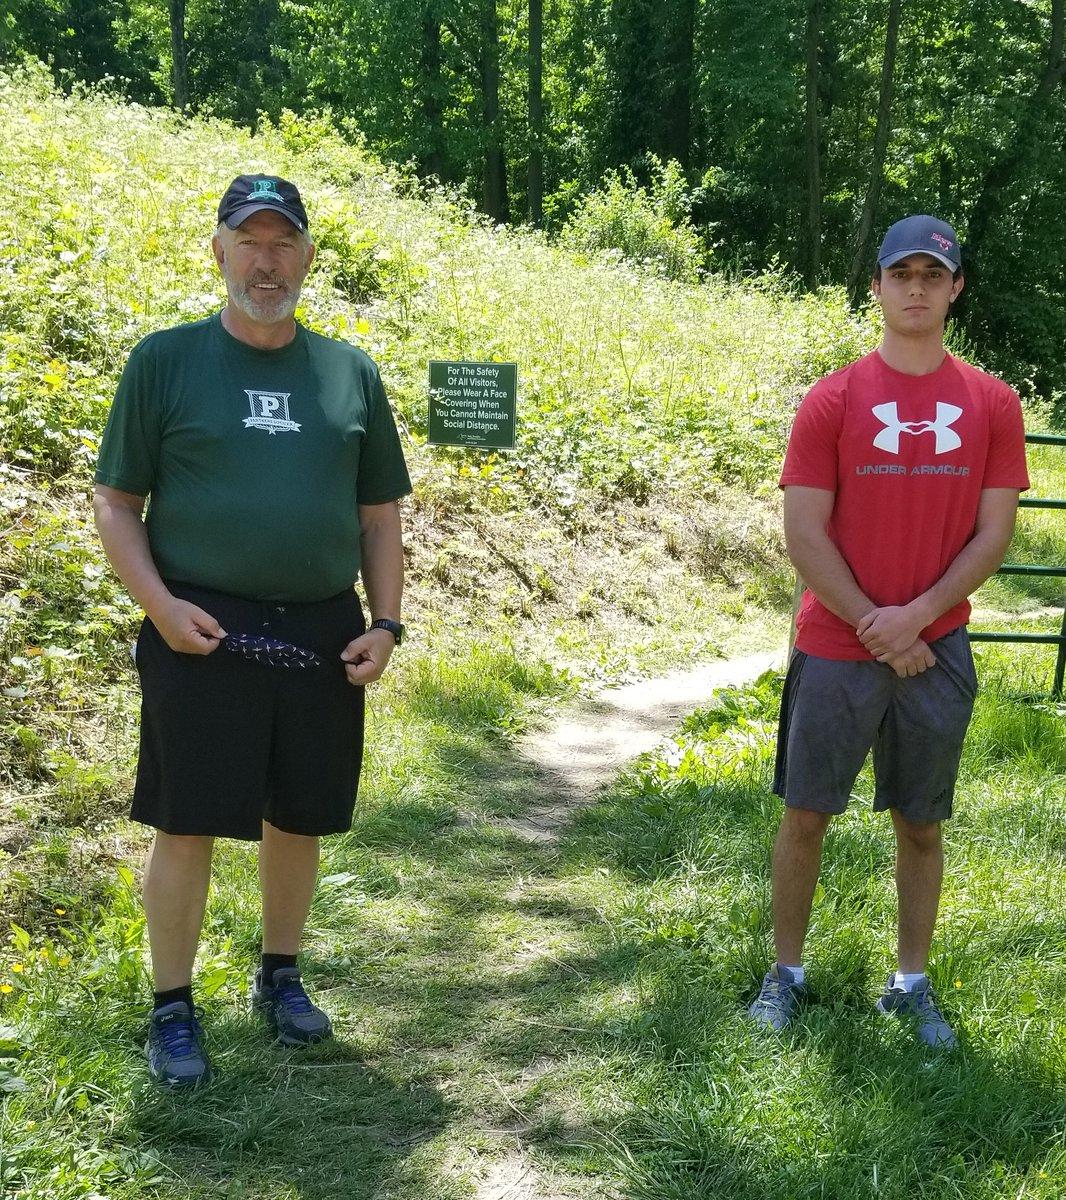 Joined Luke today for 3 miles of OCA trail walk! @MrPalumboPHS @PvillegirlsH @PHSPanthernews @Pvilleboyssocc1 @MissAPville @superlibrarian @PvilleSOS @SheldonAPReview @pvillevgsoccer @PVilleAthletics @msiokalo @Pville_6th_man @Pvilleglax https://t.co/5p56o8cZfy